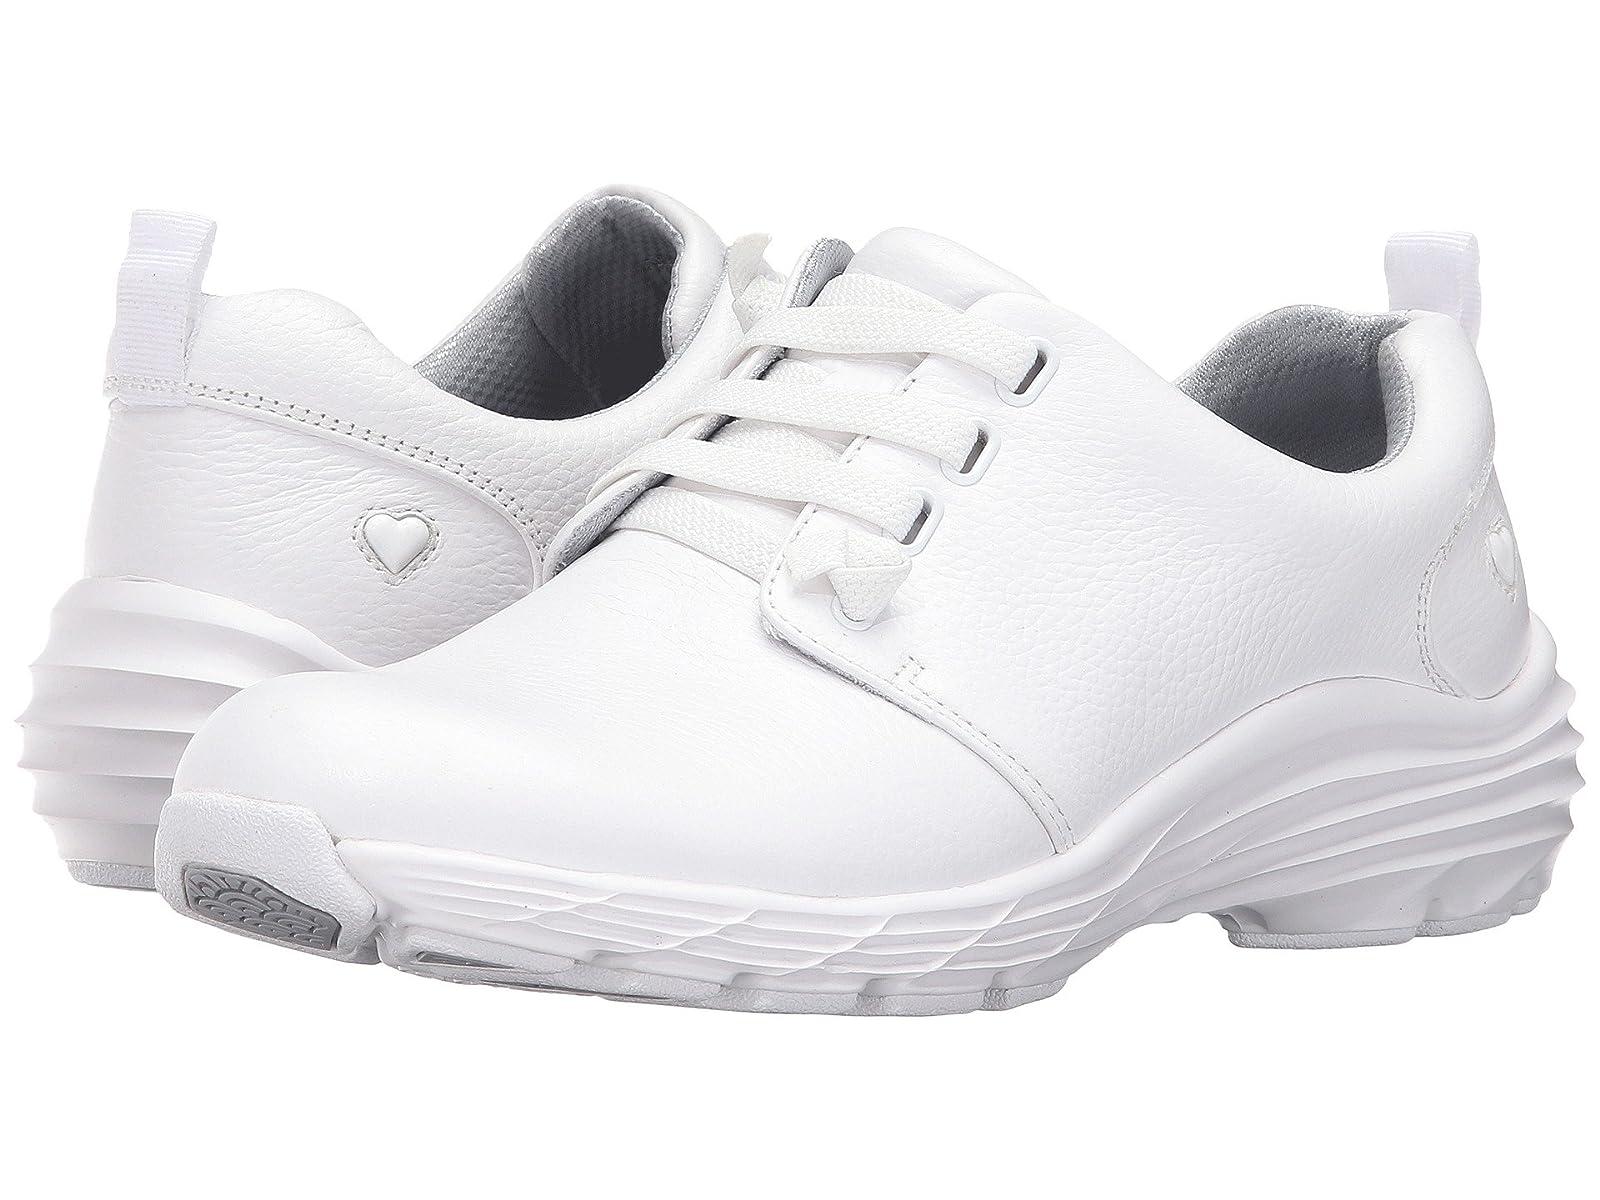 Nurse Mates VelocityAtmospheric grades have affordable shoes